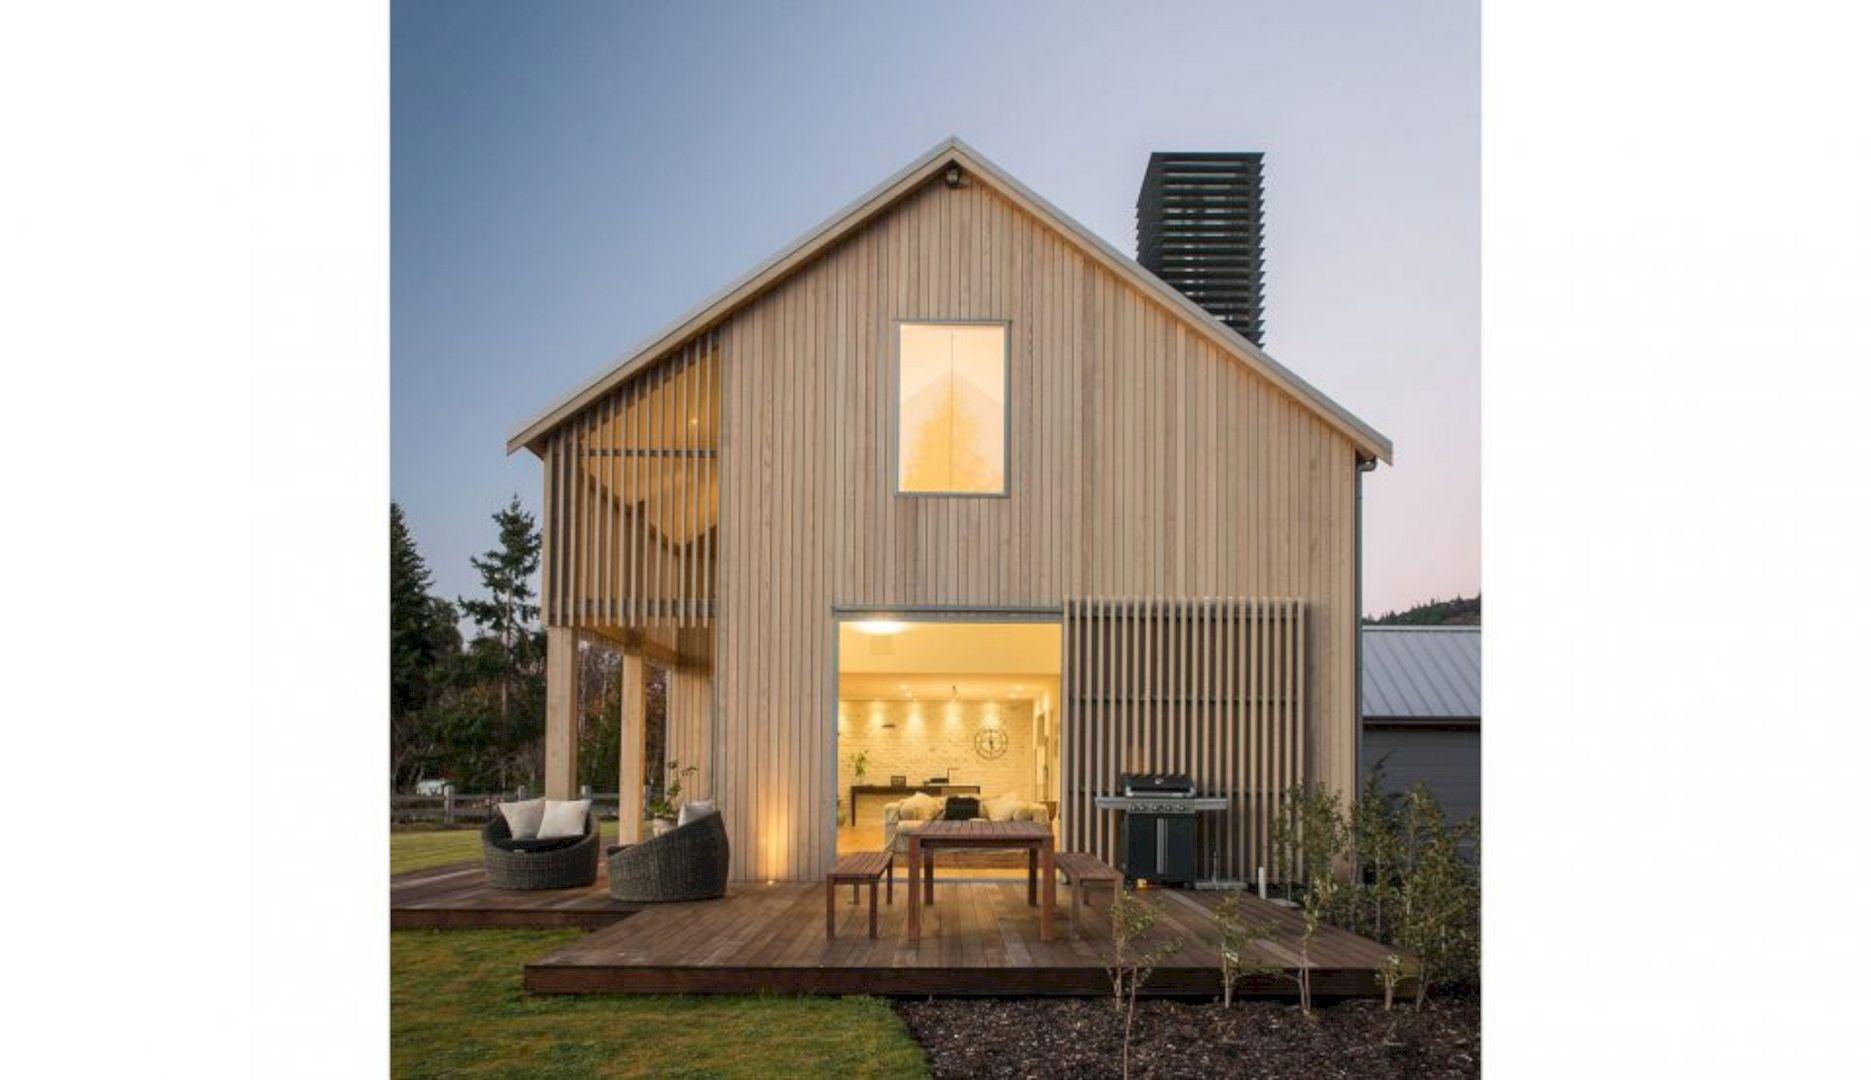 Mount Iron Barn By Condon Scott Architects 5